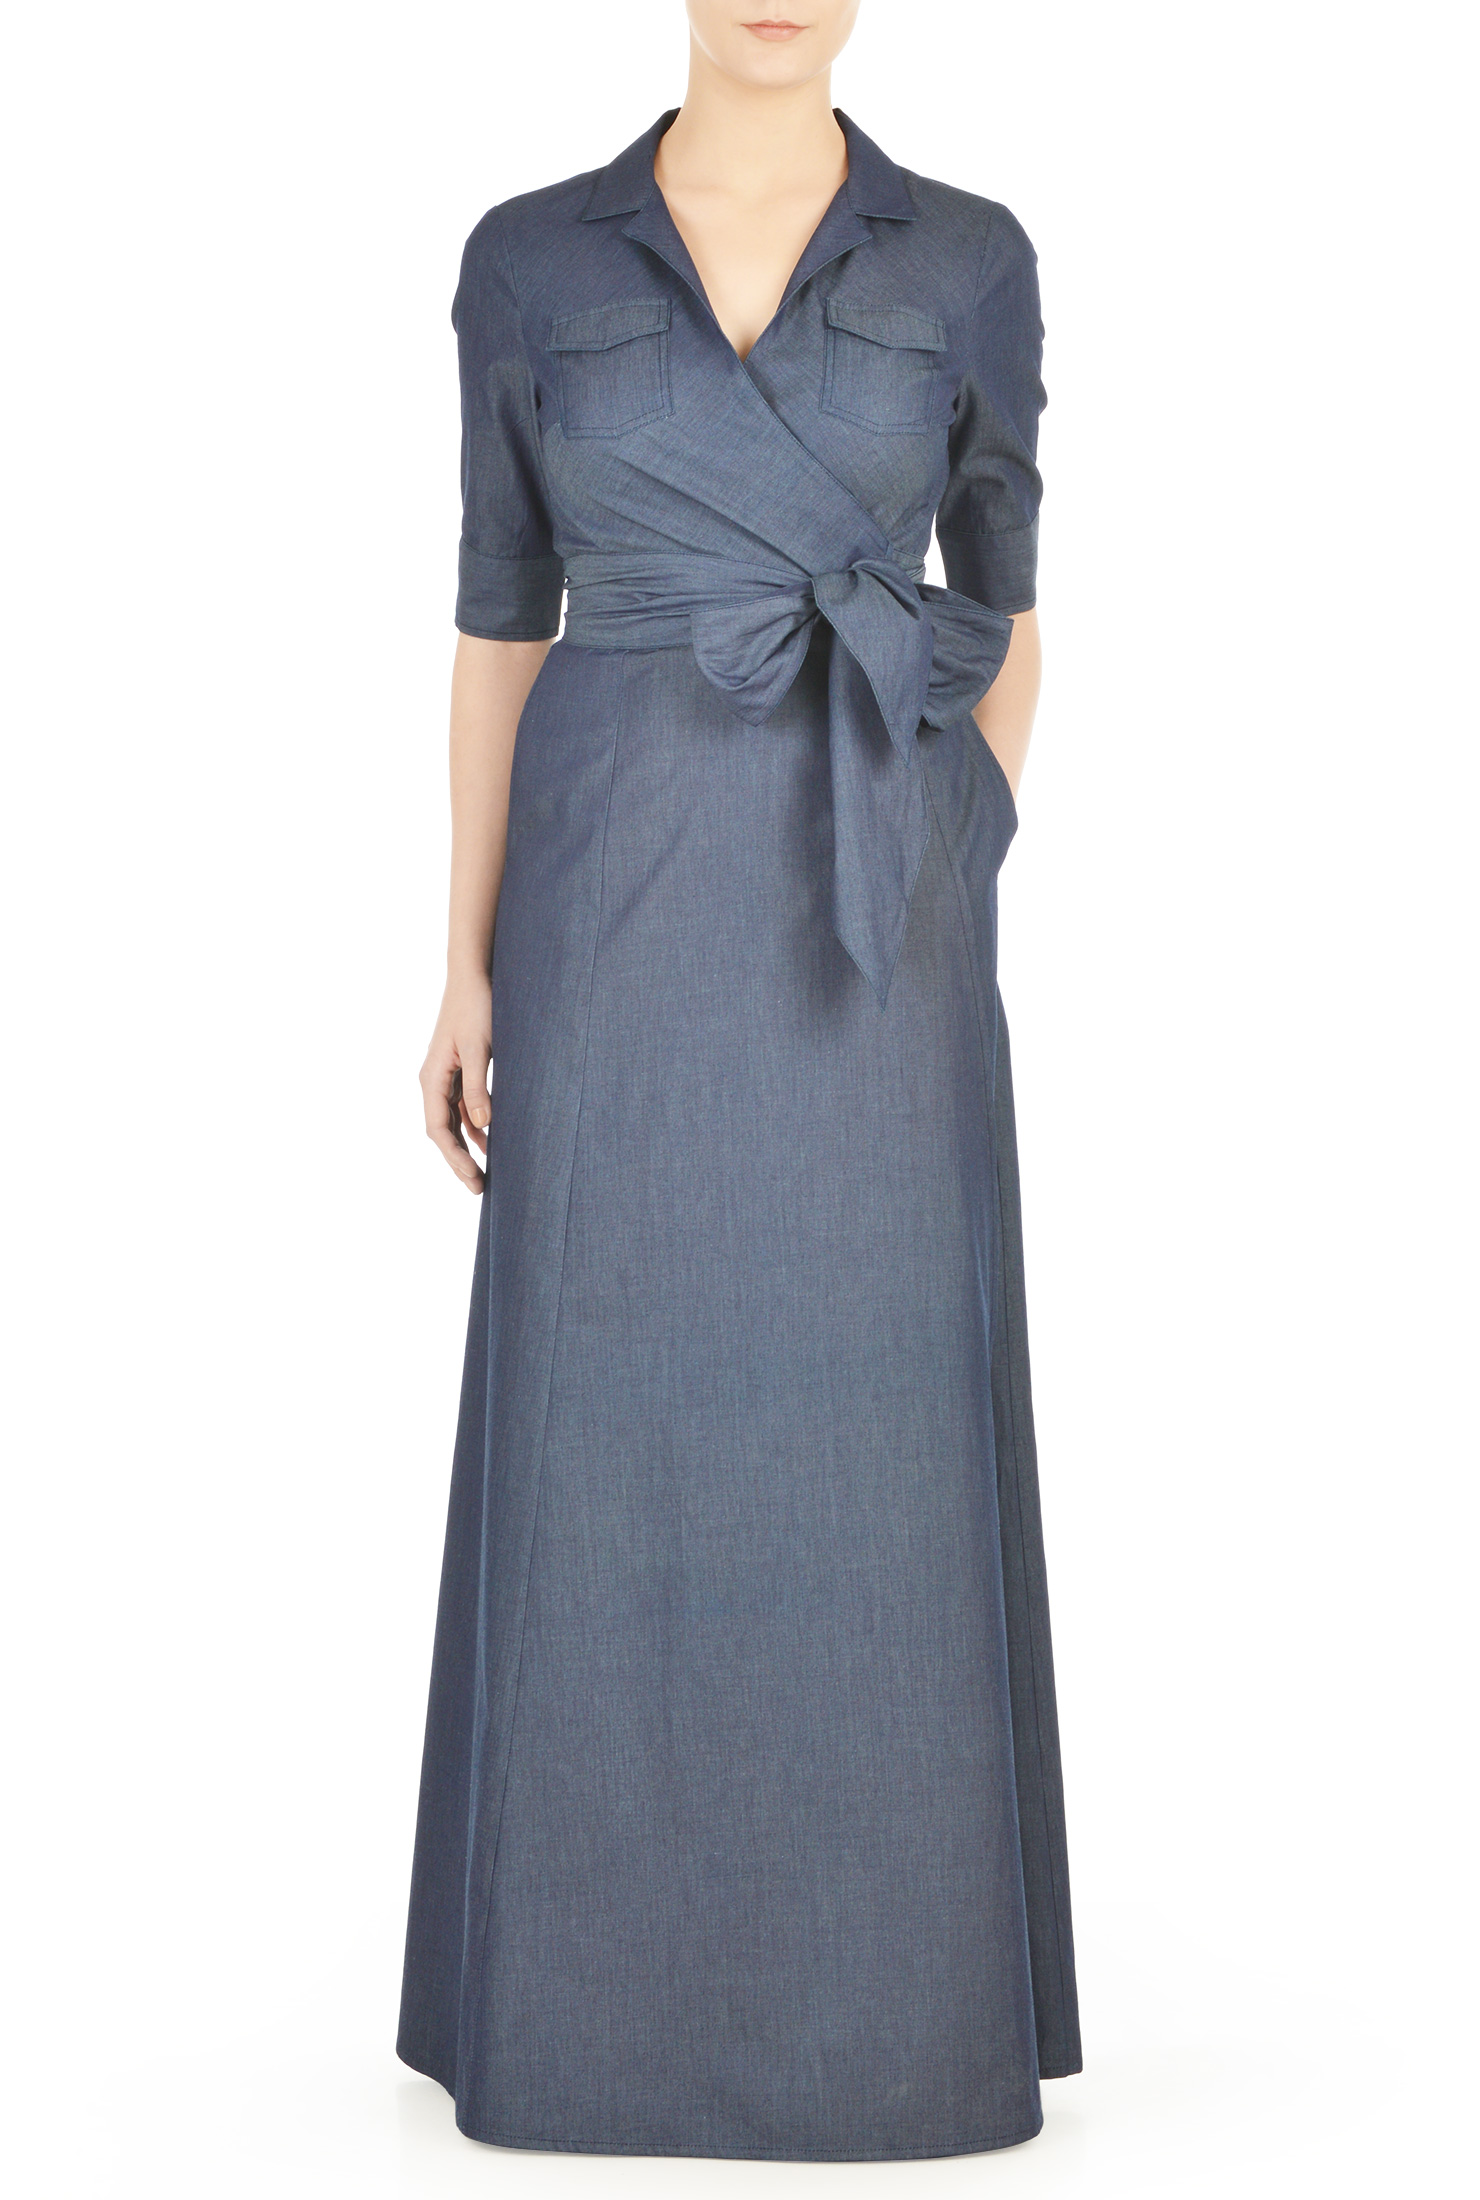 #falltrend maxi wrap dress